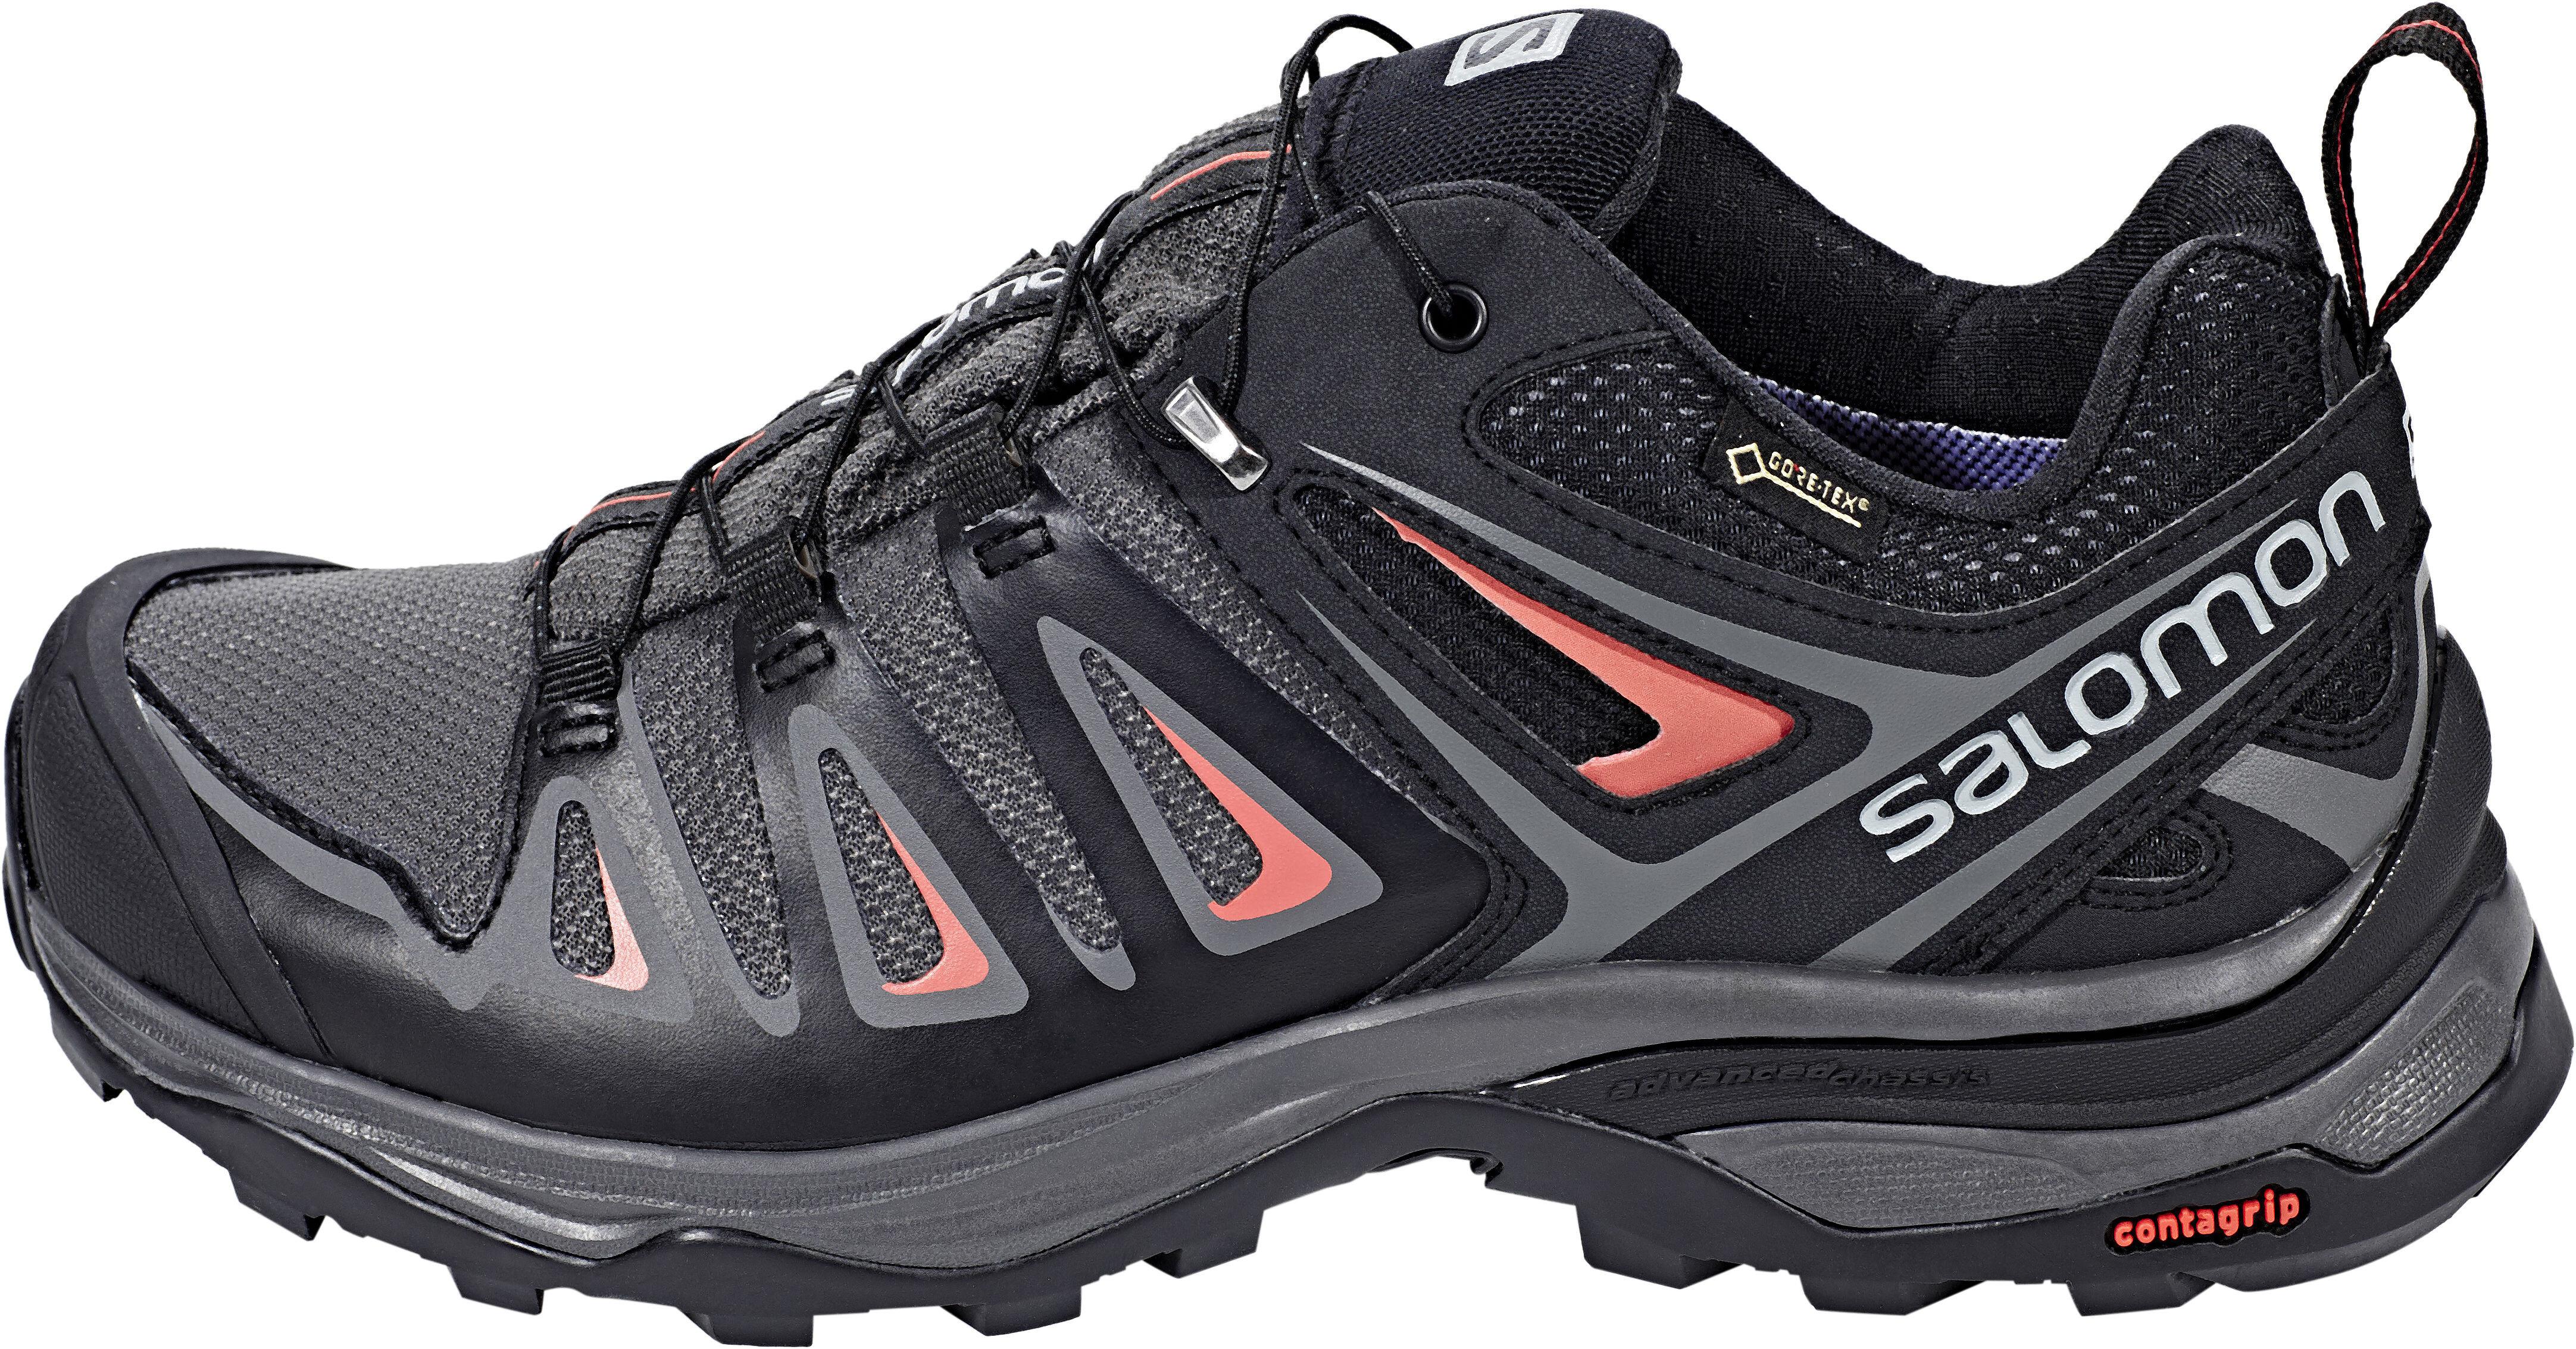 816ff218fcf Salomon X Ultra 3 GTX - Chaussures Femme - gris noir sur CAMPZ !